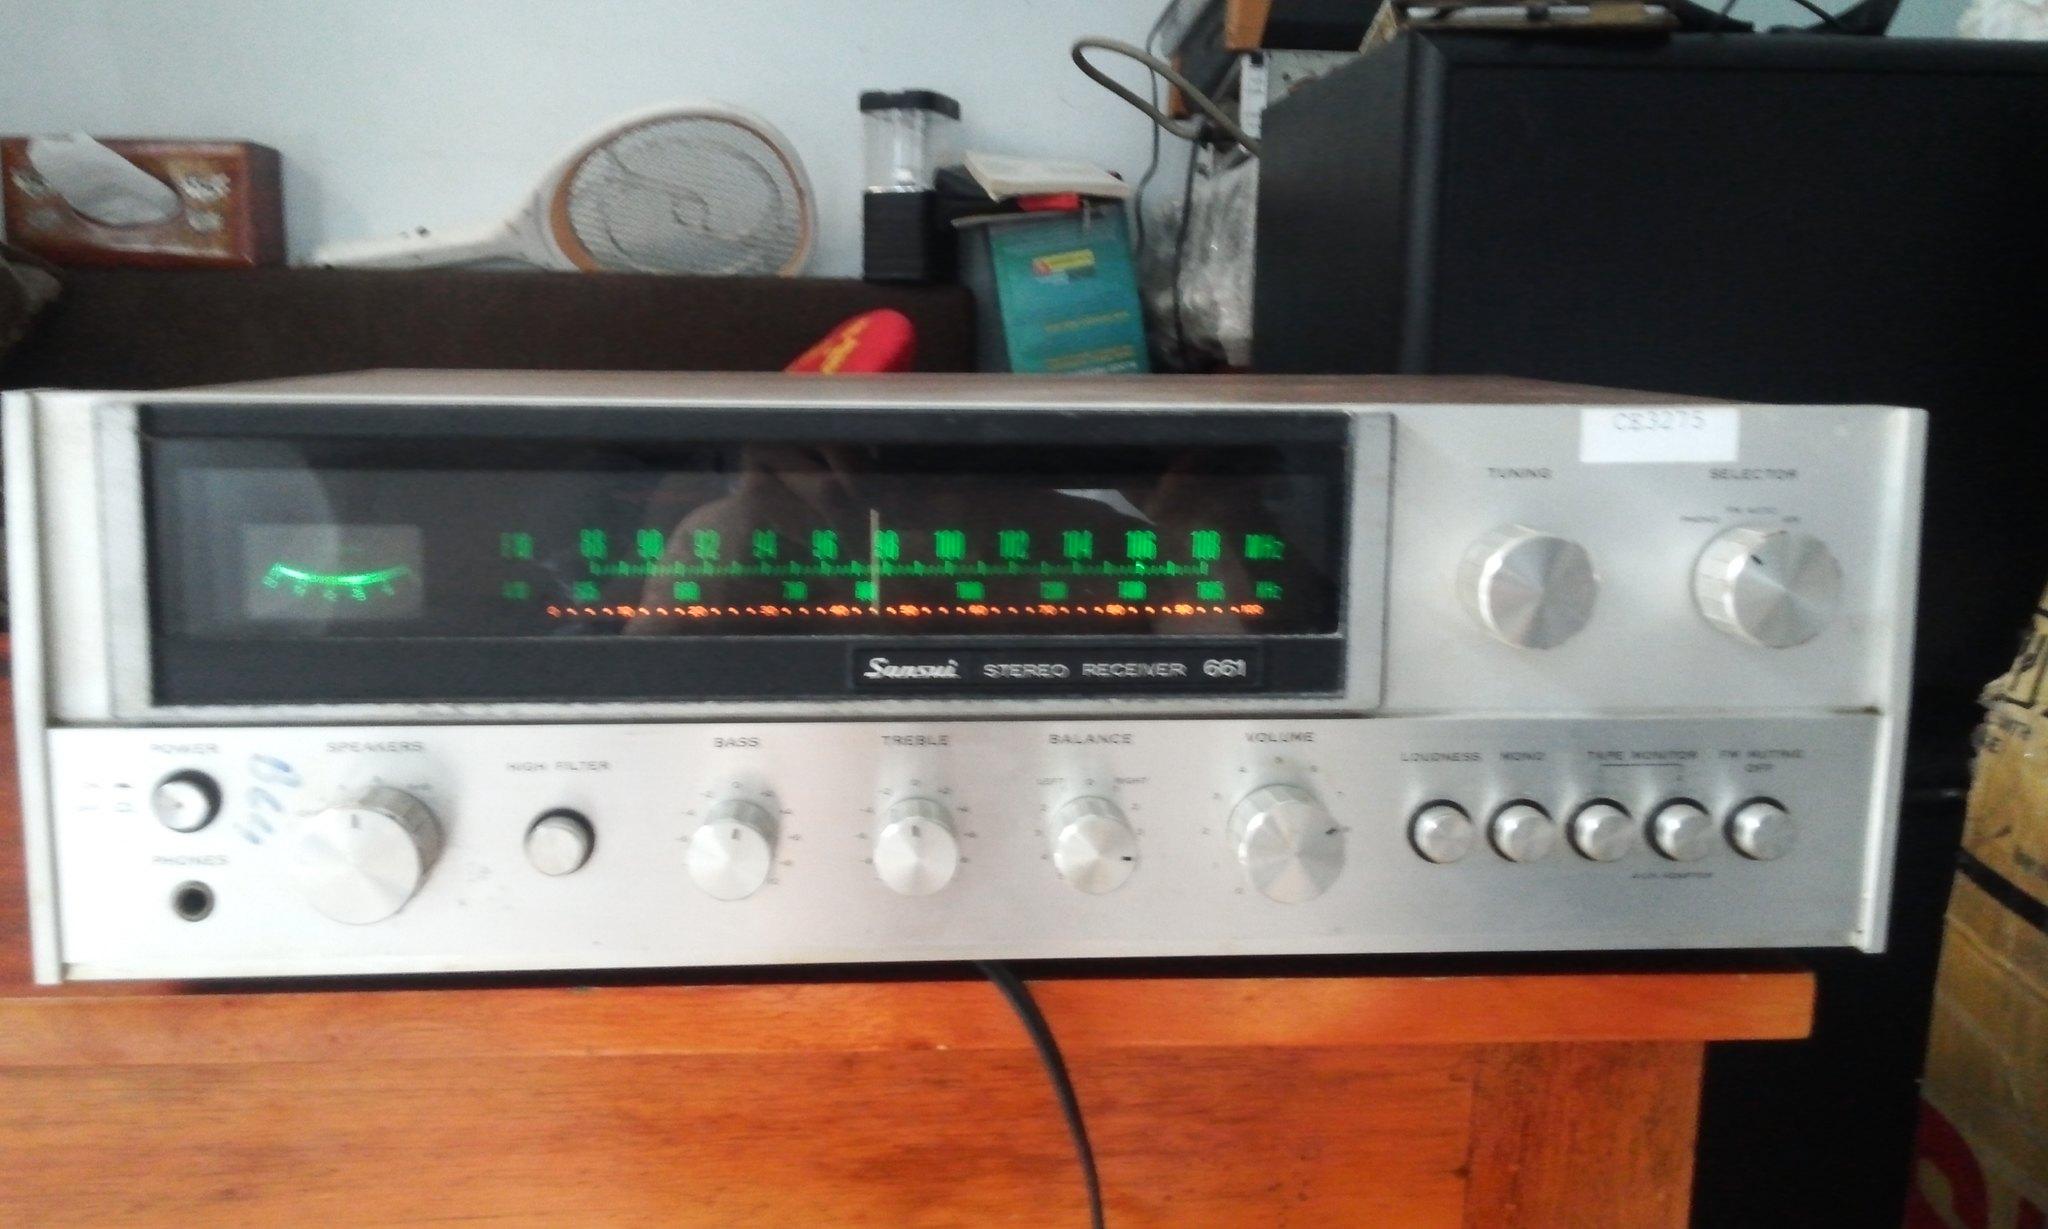 NHO AUDIO-Chuyên loa sub điện -ampli -loa  mỹ -anh - 44